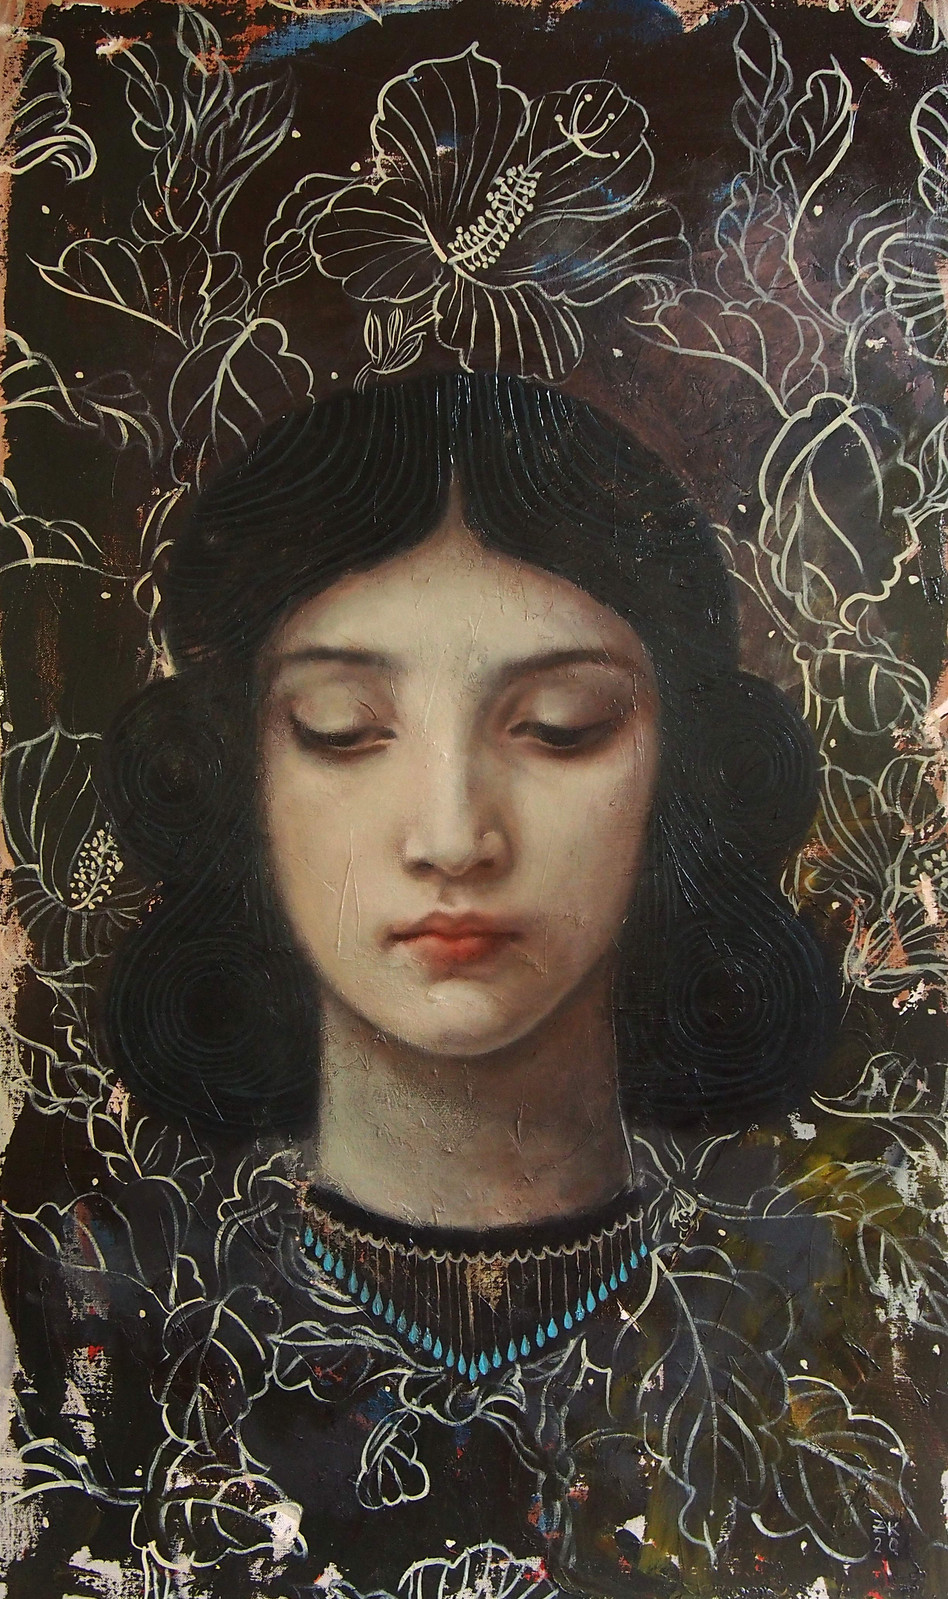 Woman Born of Flowers, Blodeuwedd